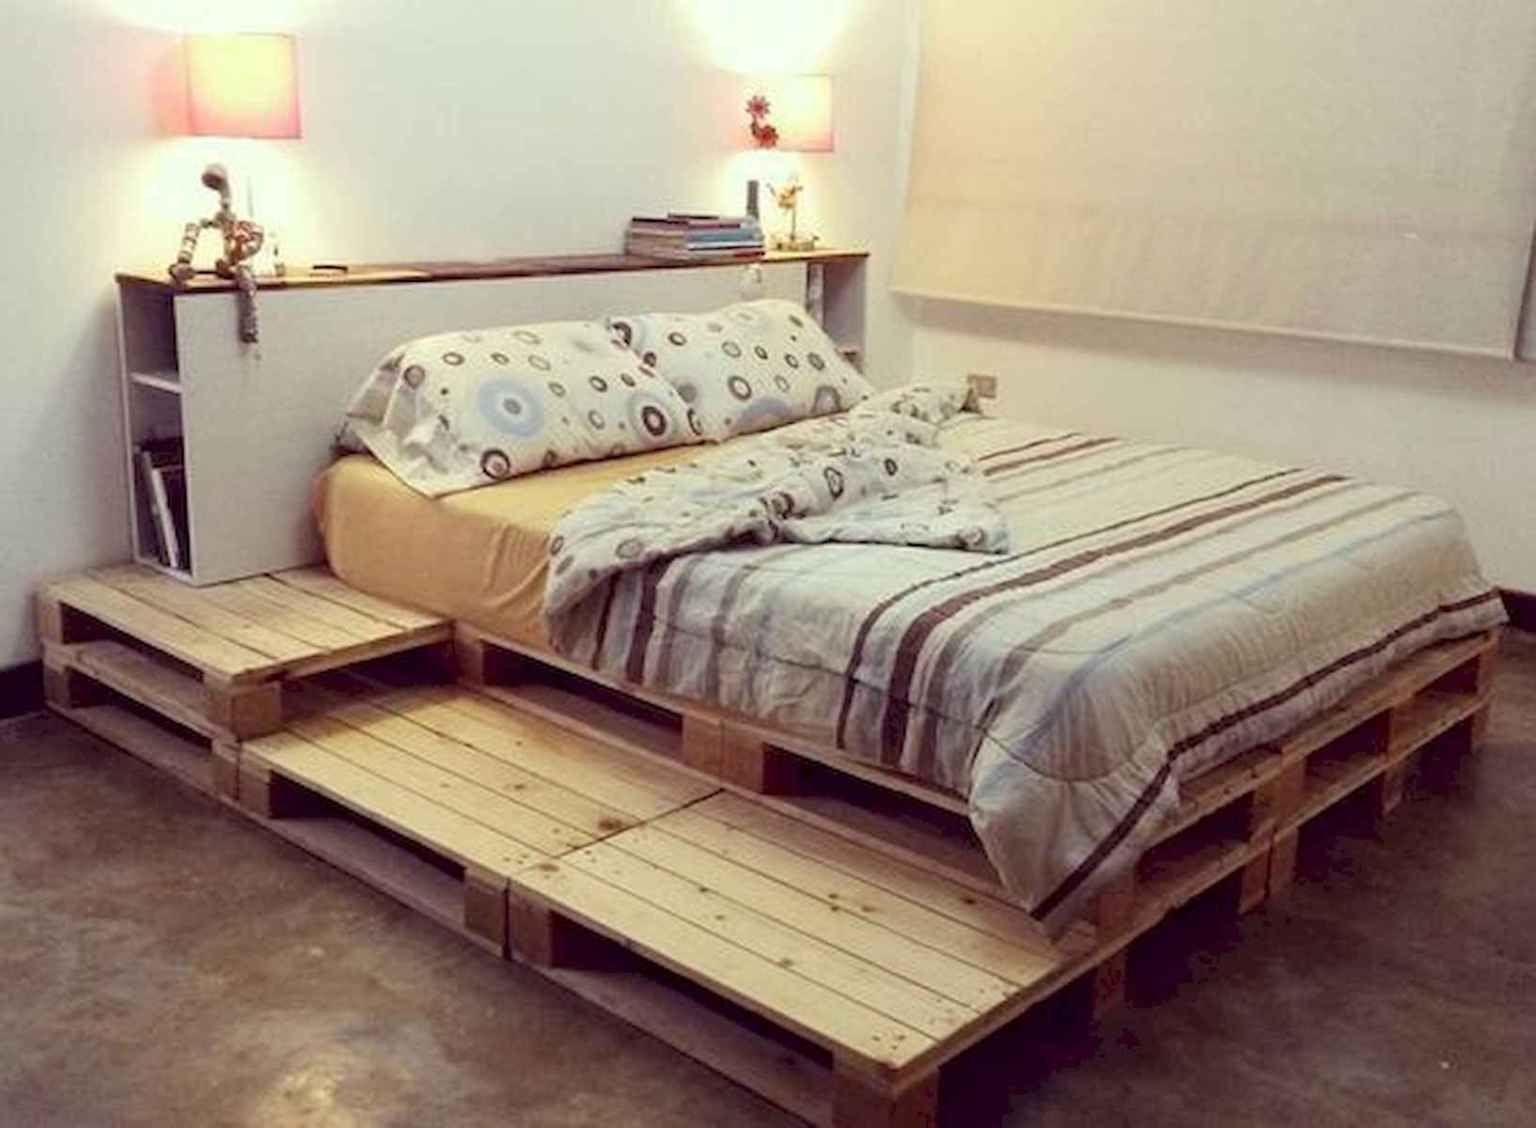 diy queen bed frame in 2020 Diy pallet bed, Pallet bed